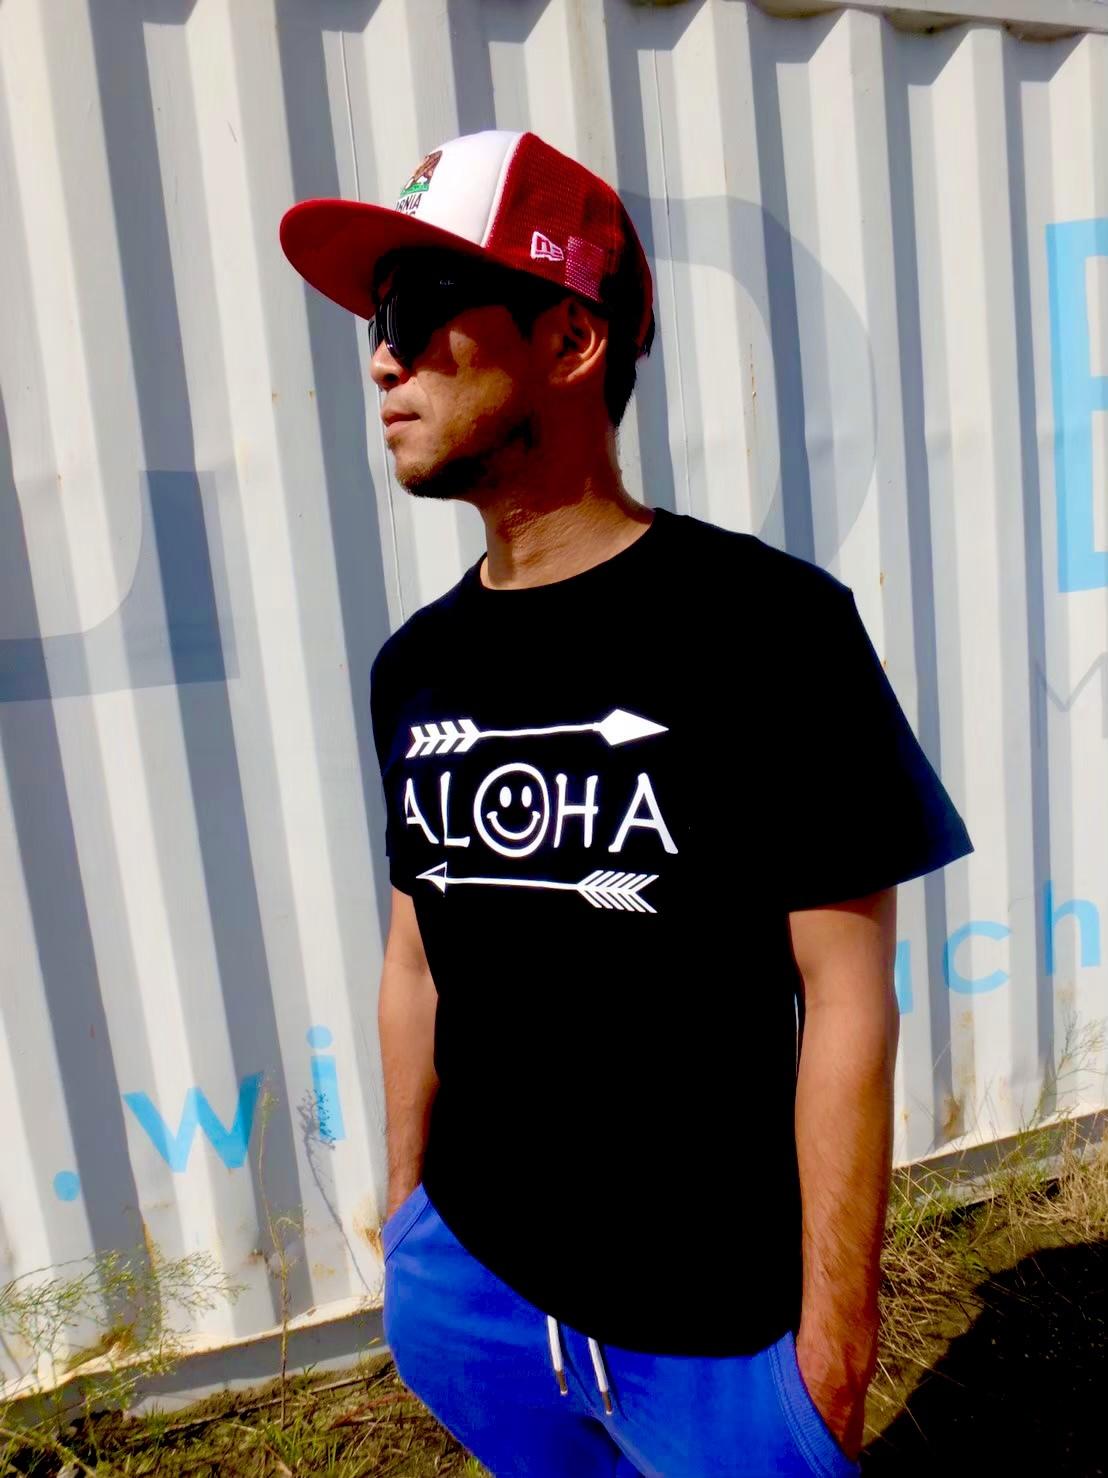 Aloha smile Tshirt